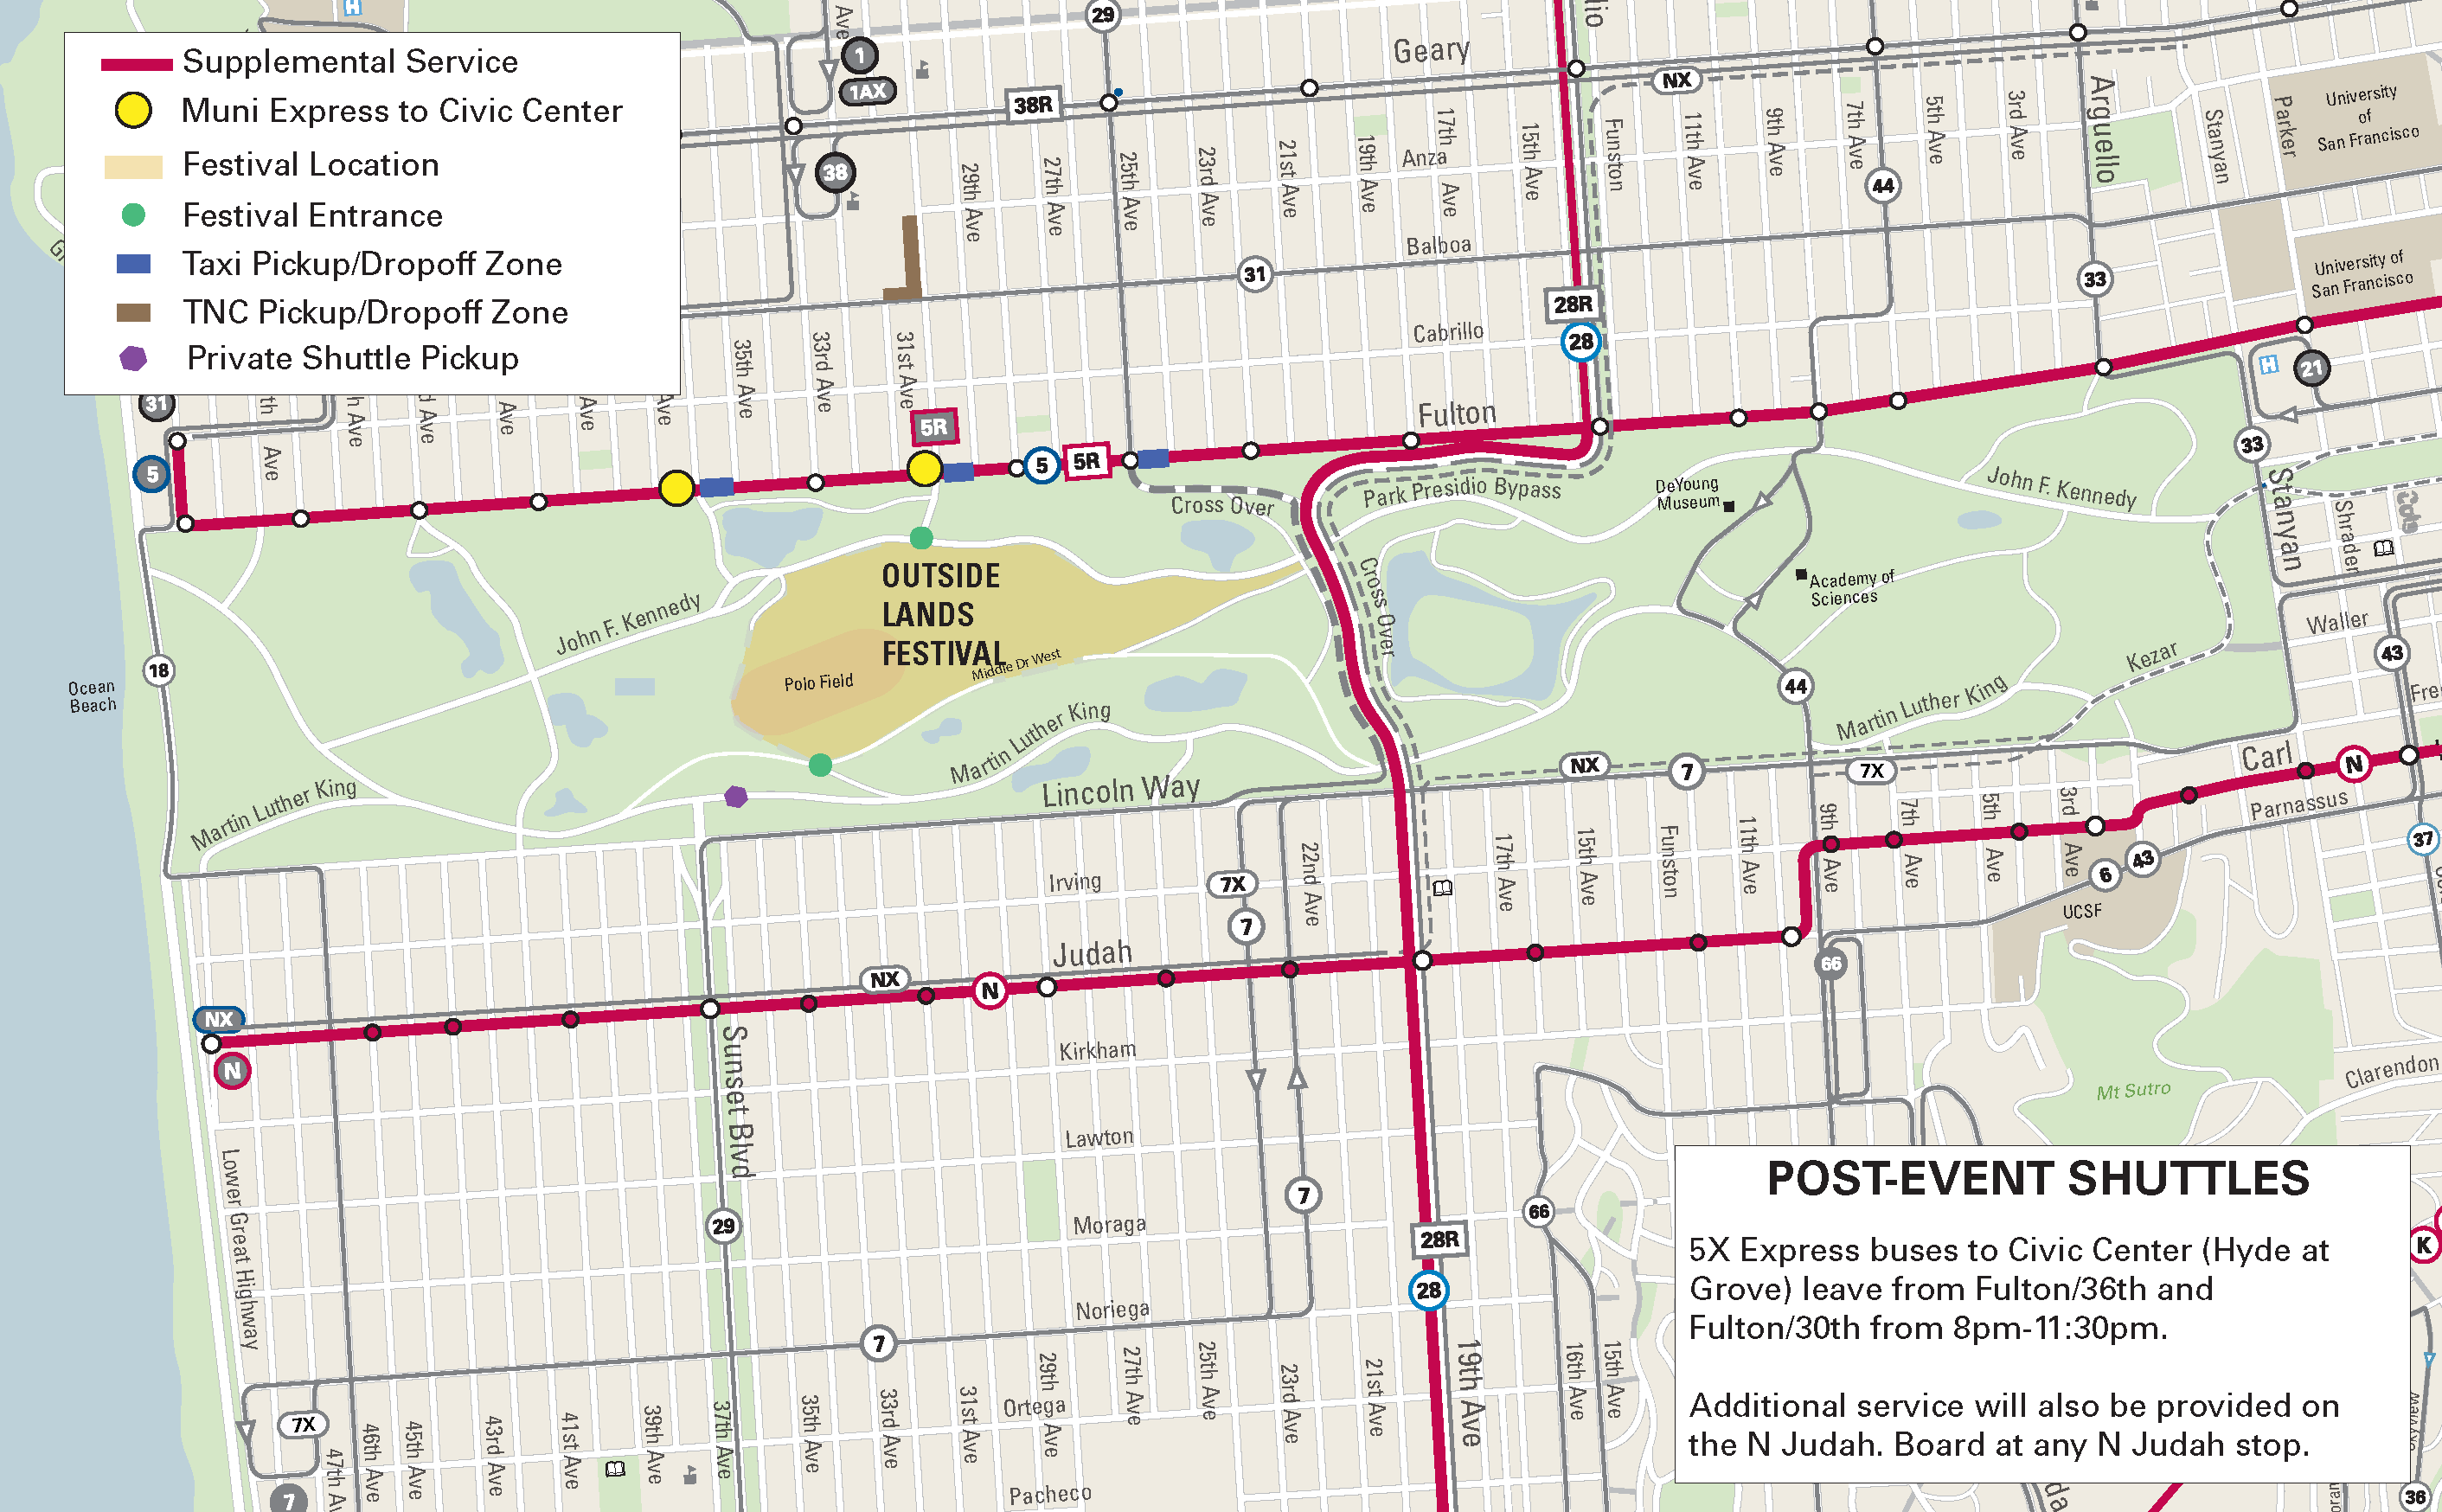 Outside Lands 2017 Map parking street closures Muni routes